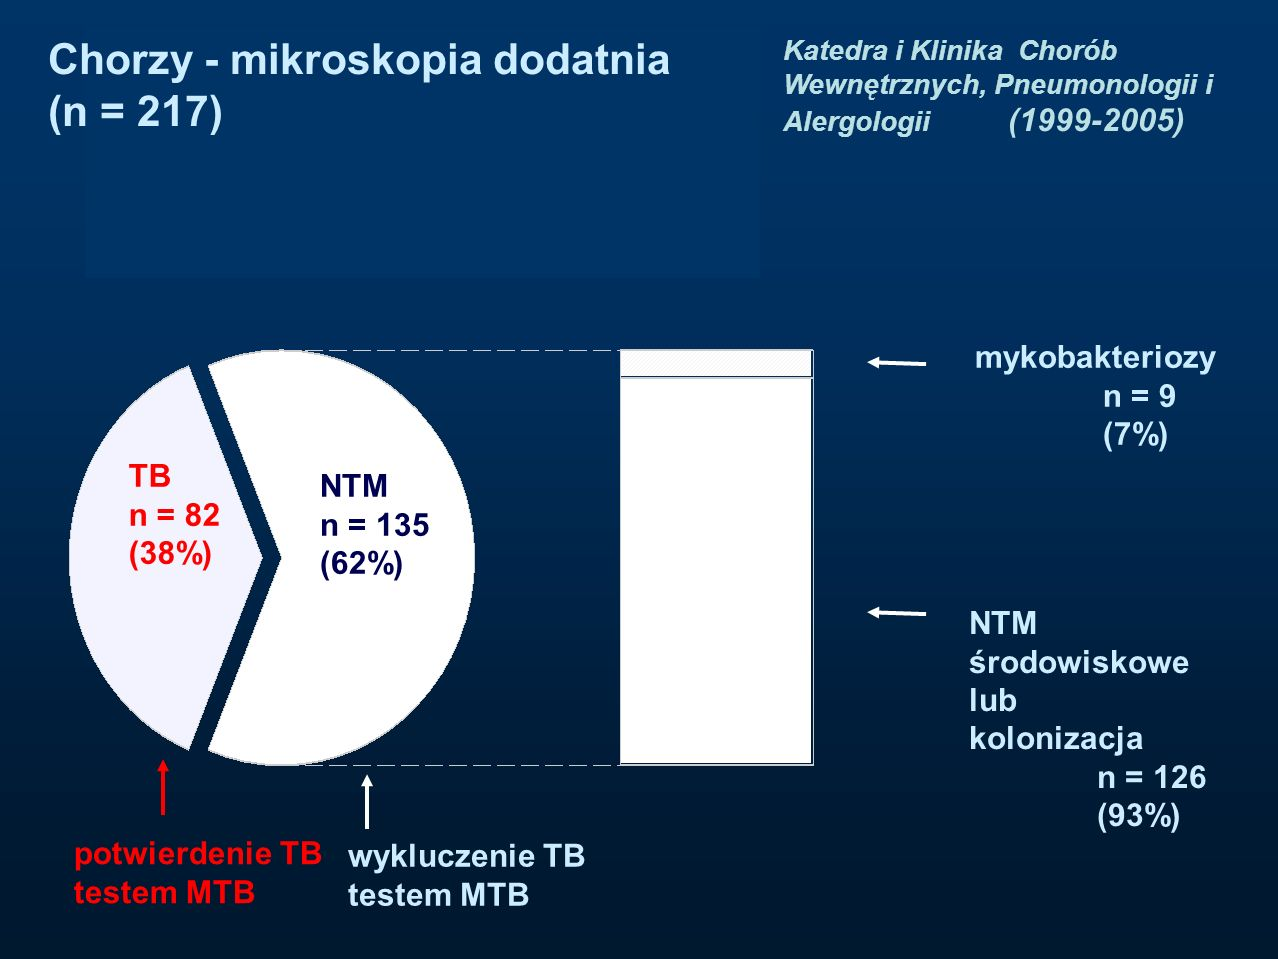 Chorzy - mikroskopia dodatnia (n = 217)